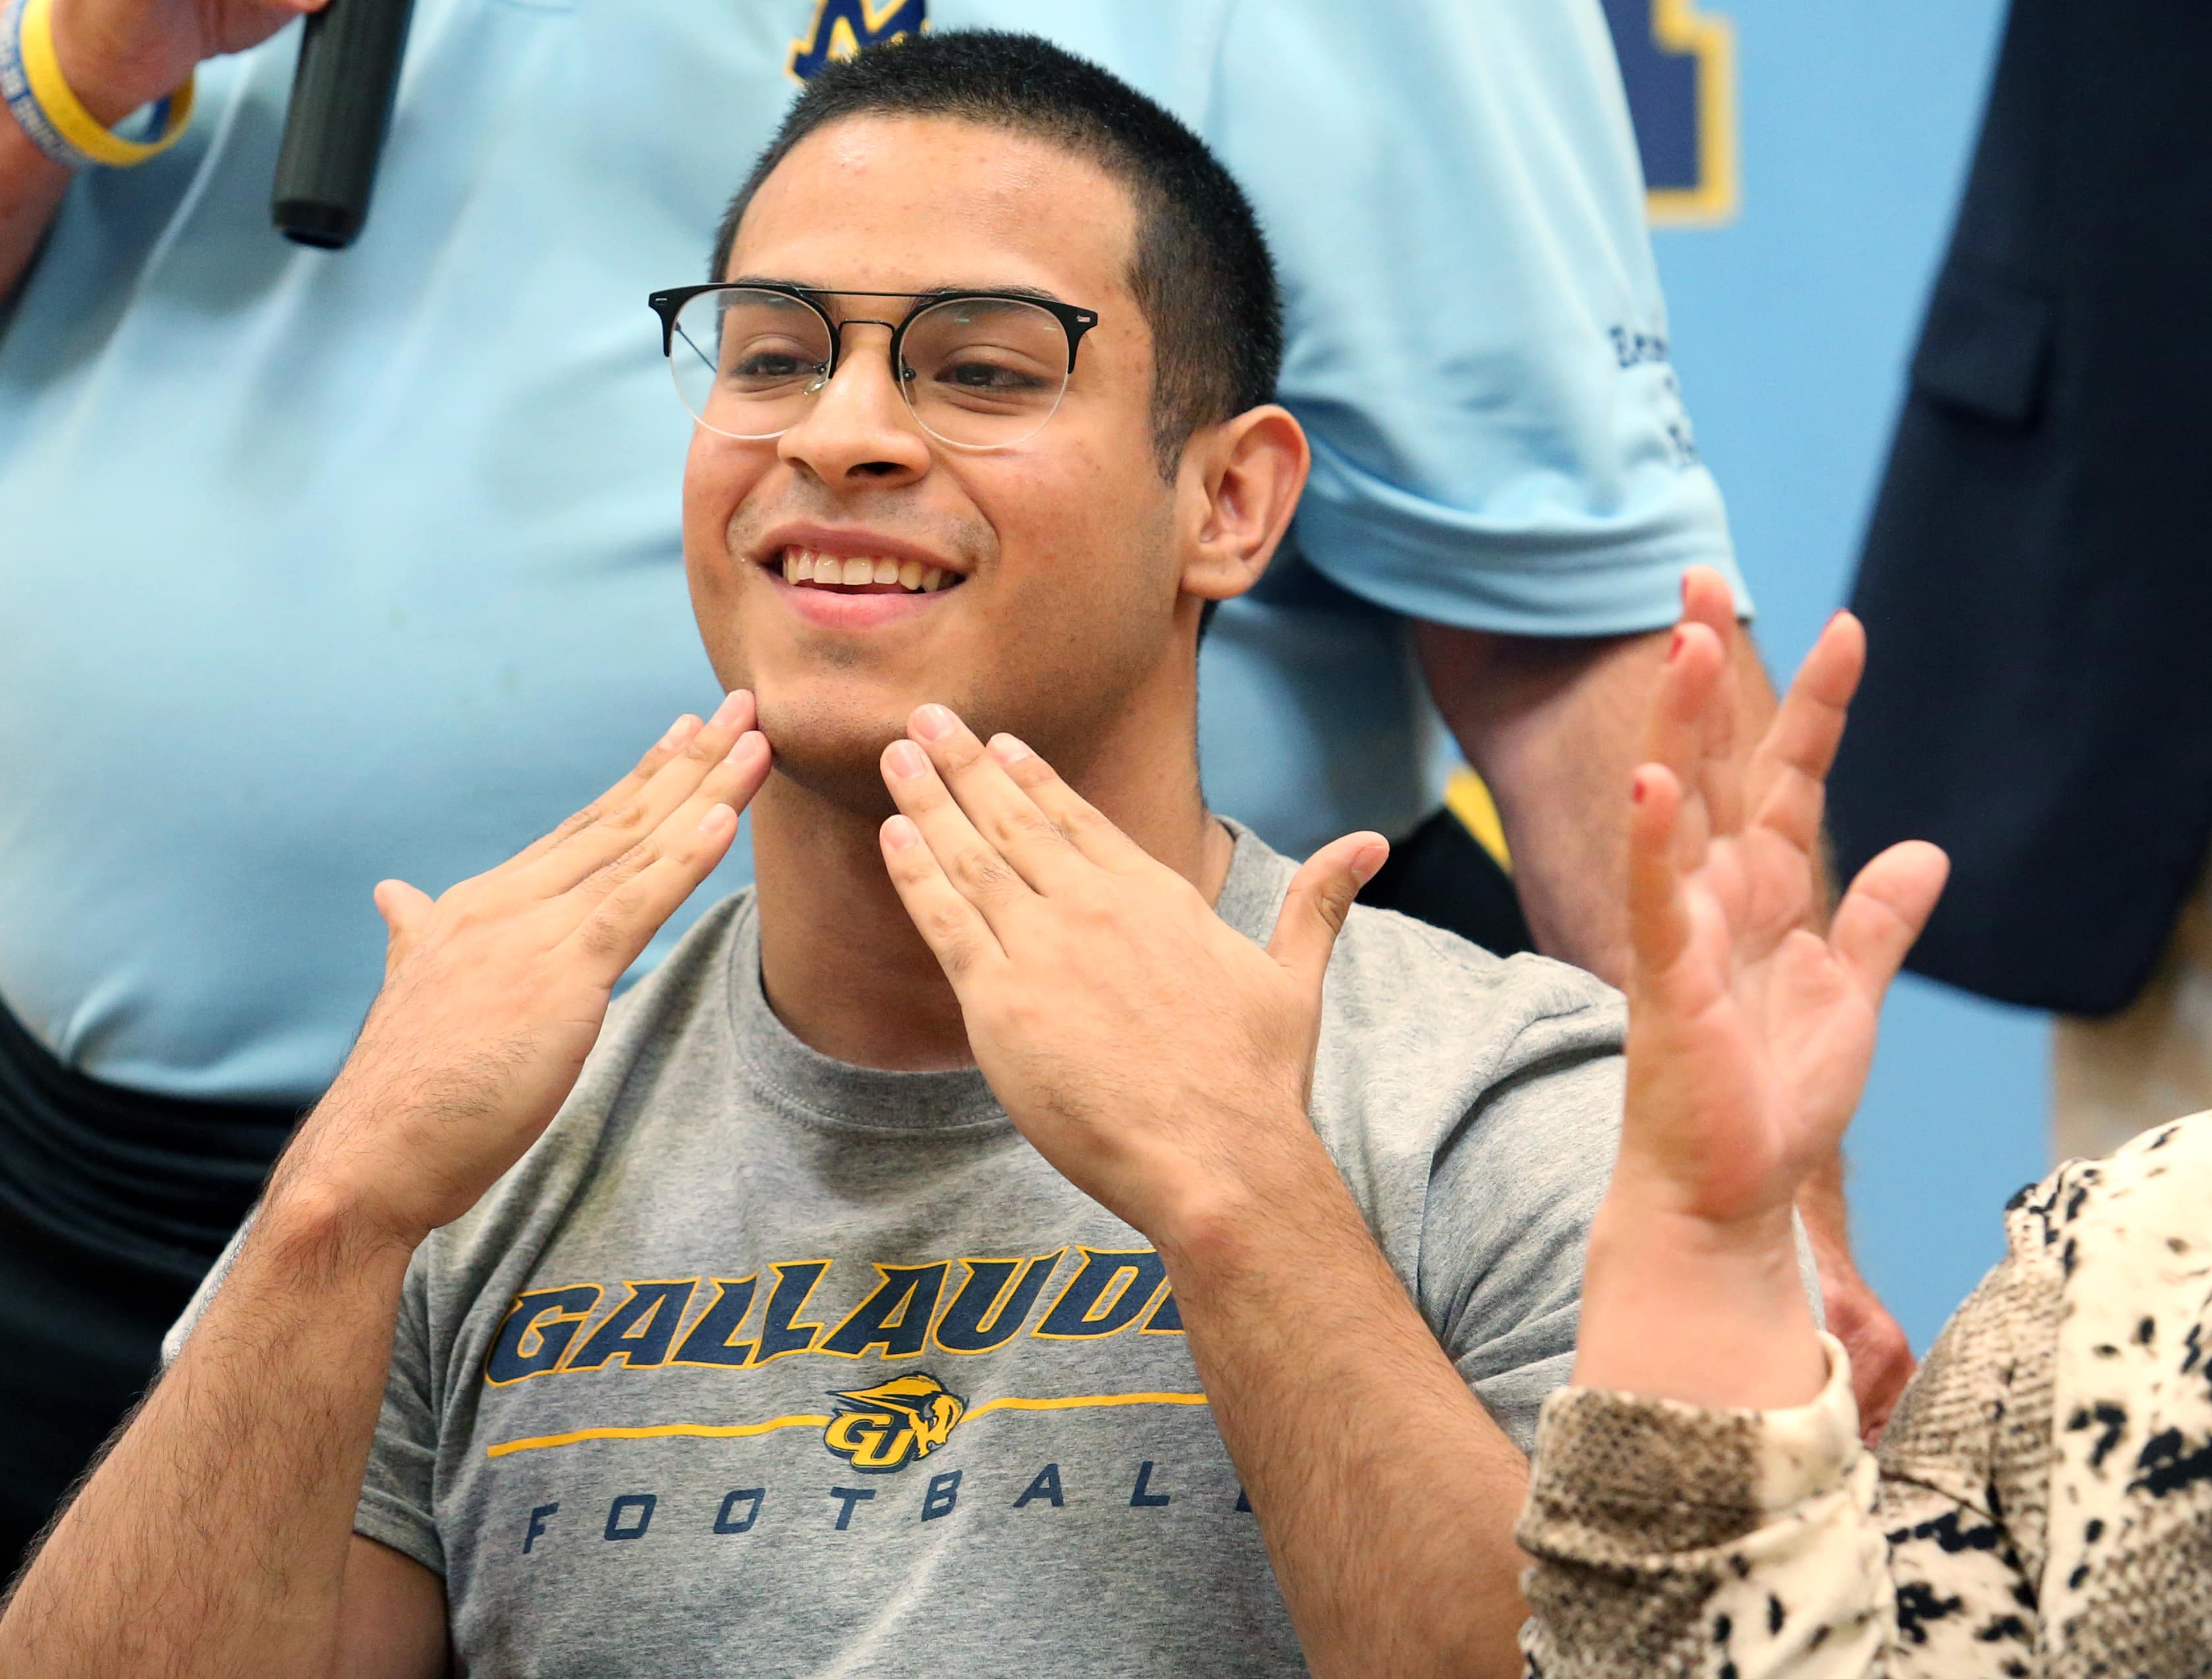 Determination scores: McAllen Memorial's Alegria signs to play football at hearing-impaired university   MyRGV.com